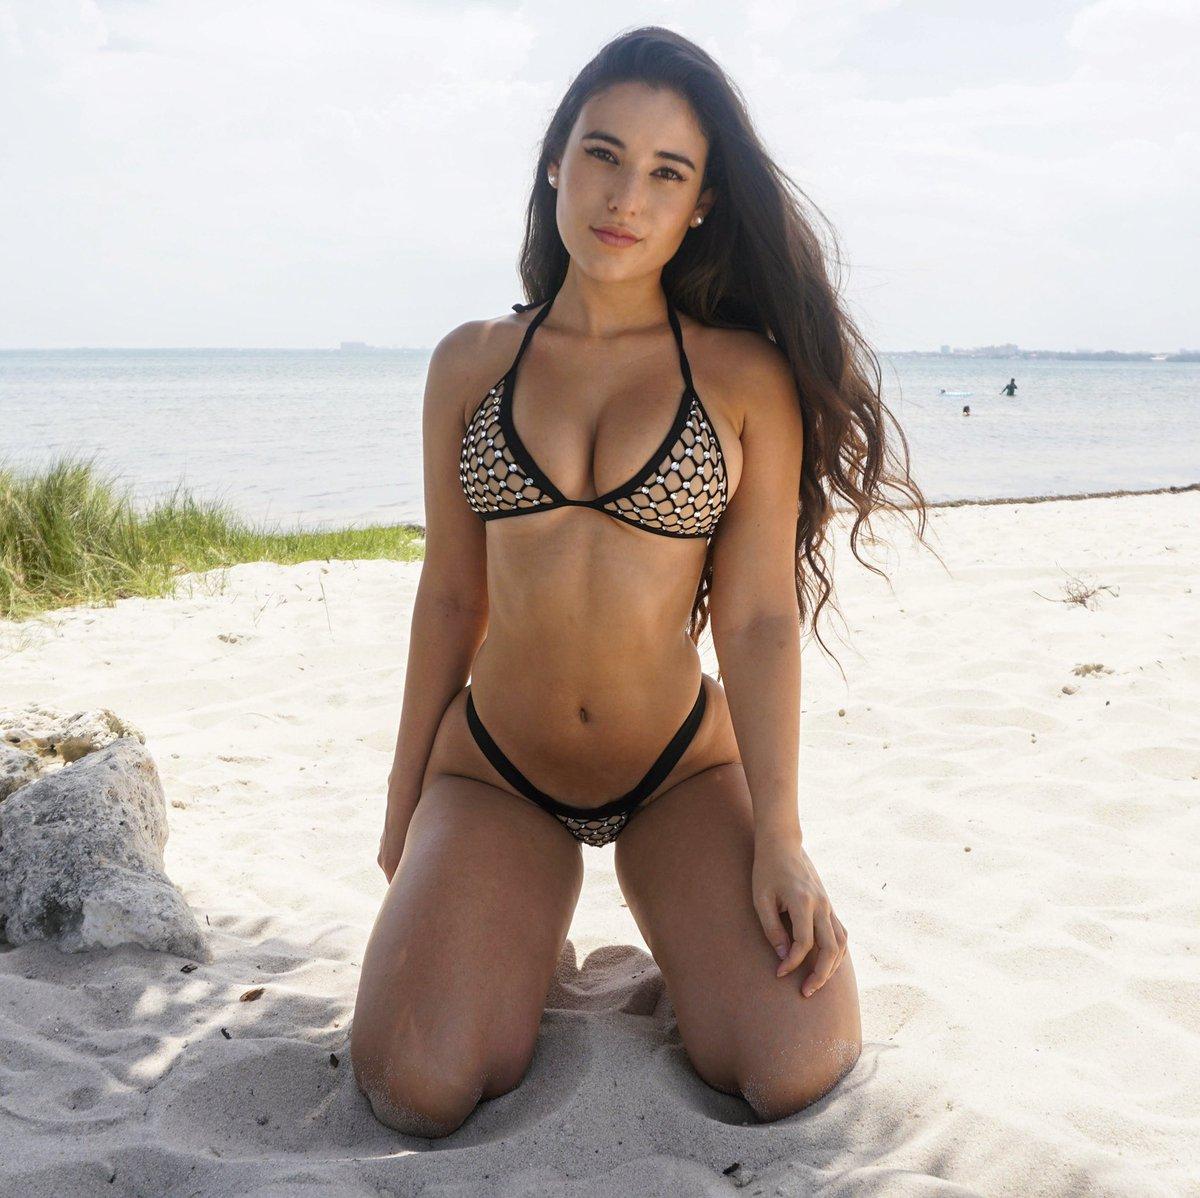 Angie Varona Sexy angie varona™'s tweet - trendsmap